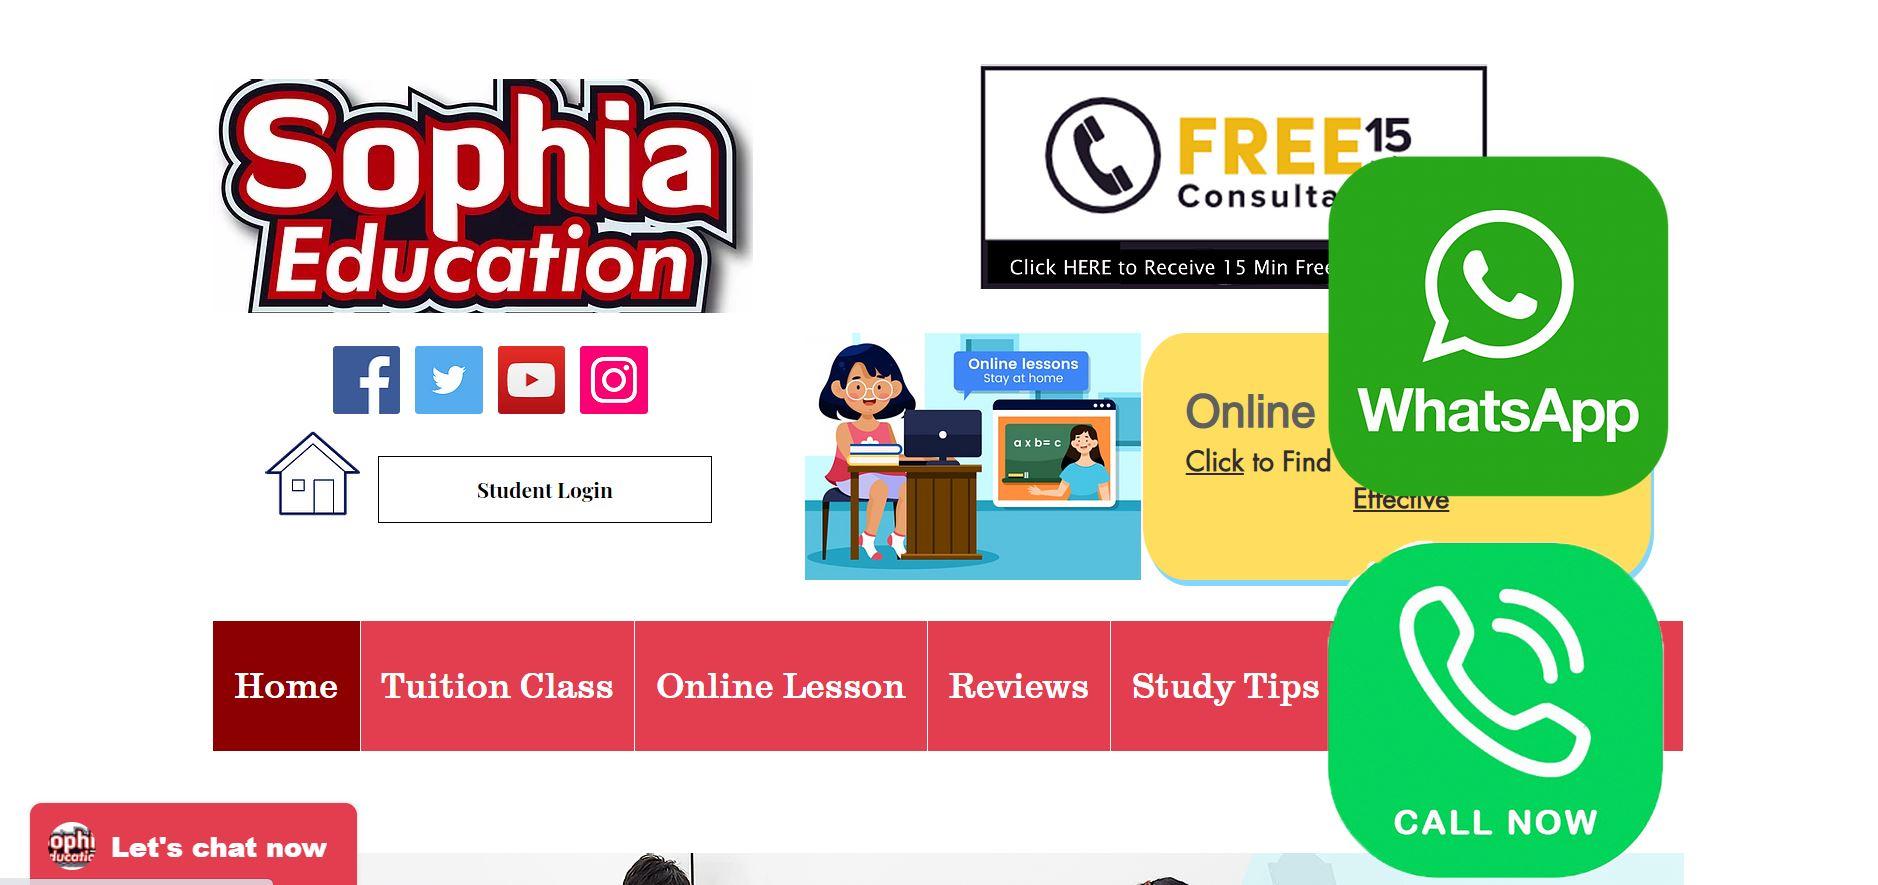 Sophia Education Secondary School Tuition